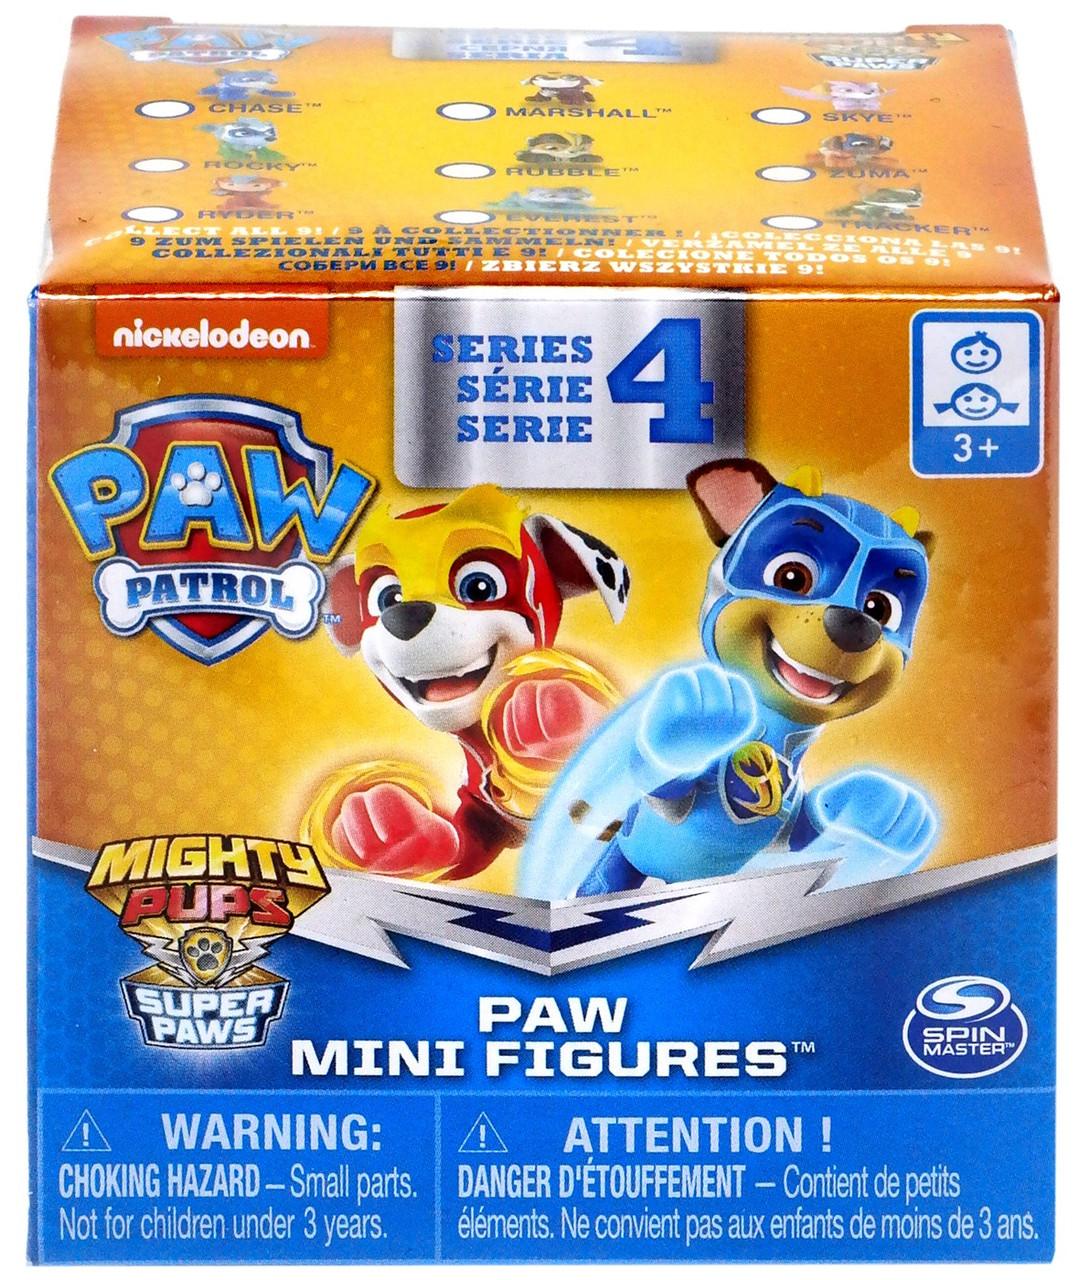 Paw Patrol open blind bag mini figure CHASE NEW